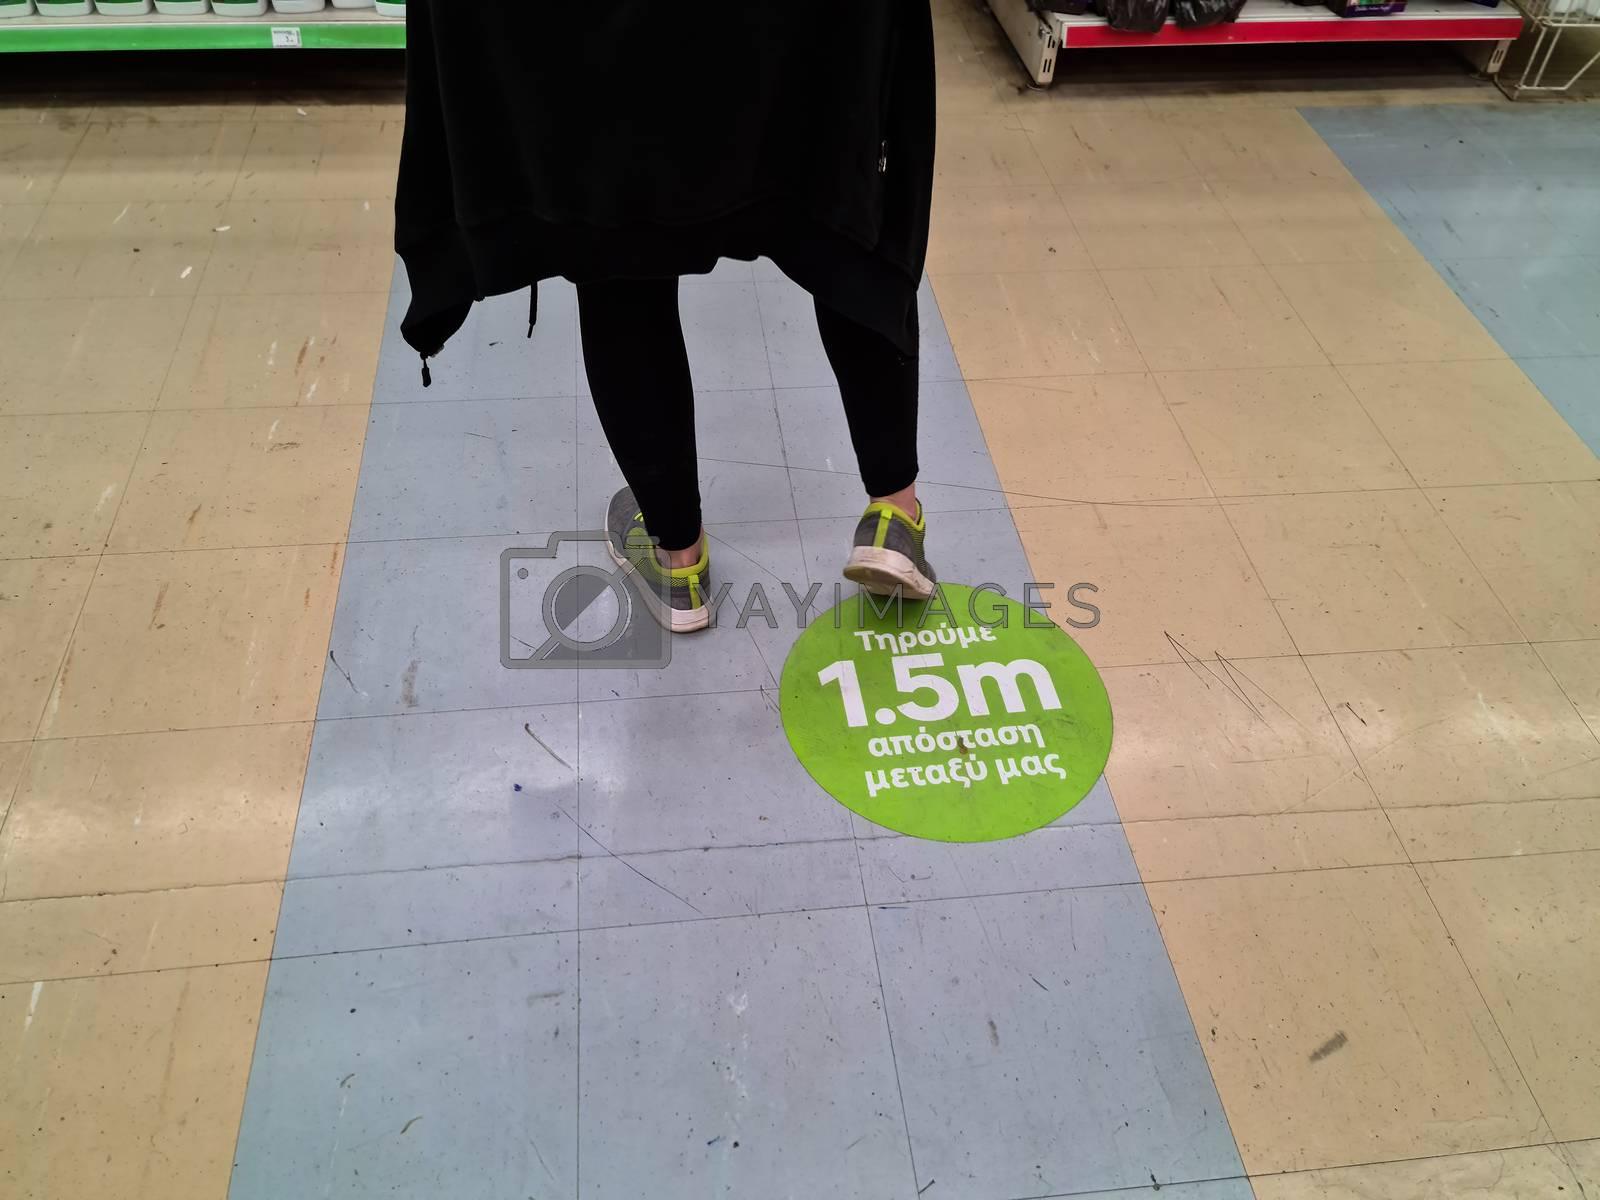 Floor sticker suggesting customers keep 1.5 meters away inside store as Coronavirus measures affect business & daily life.